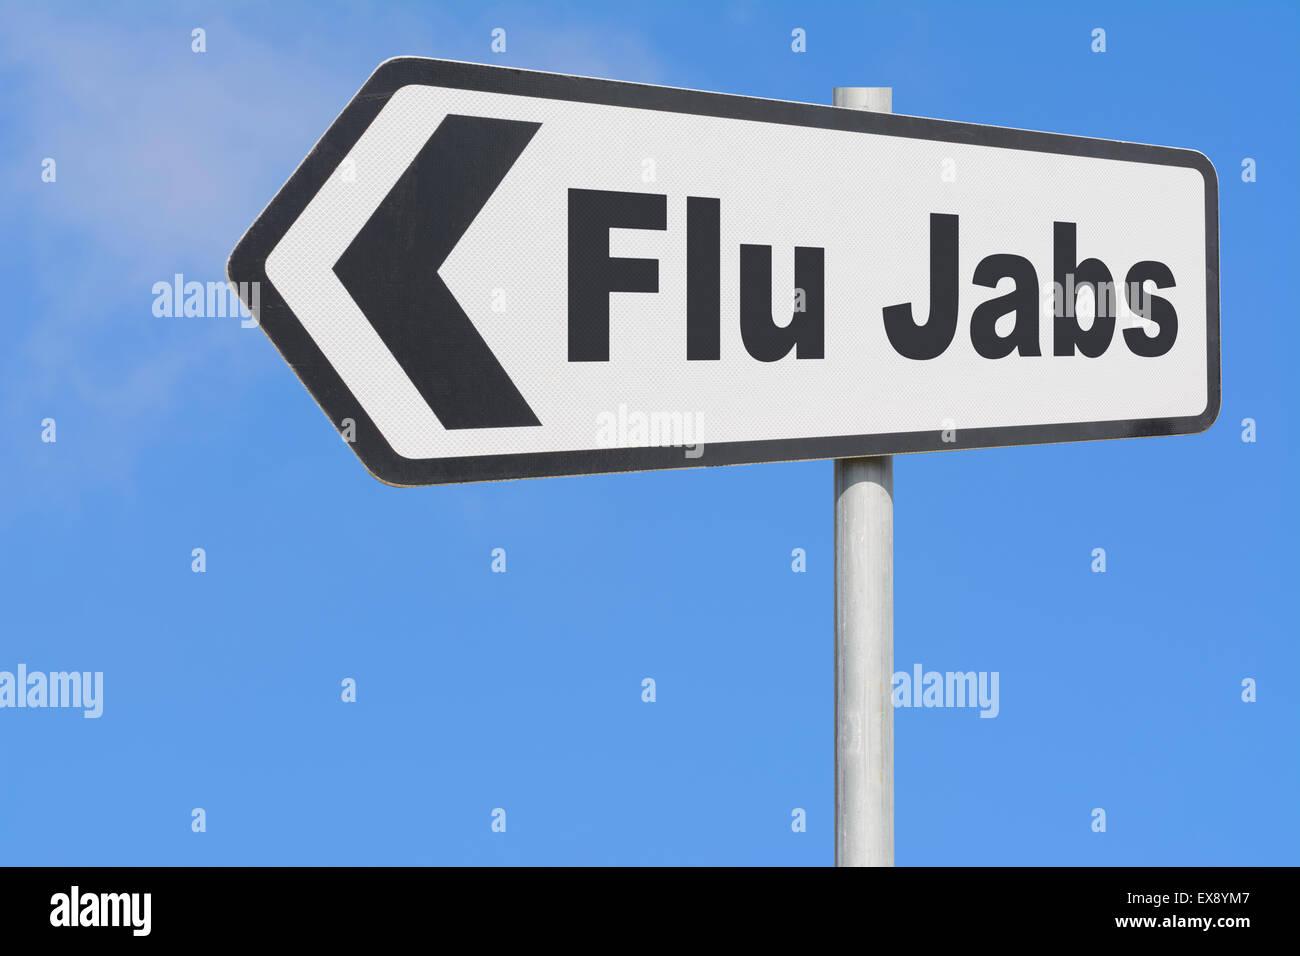 Flu Jabs direction sign. - Stock Image